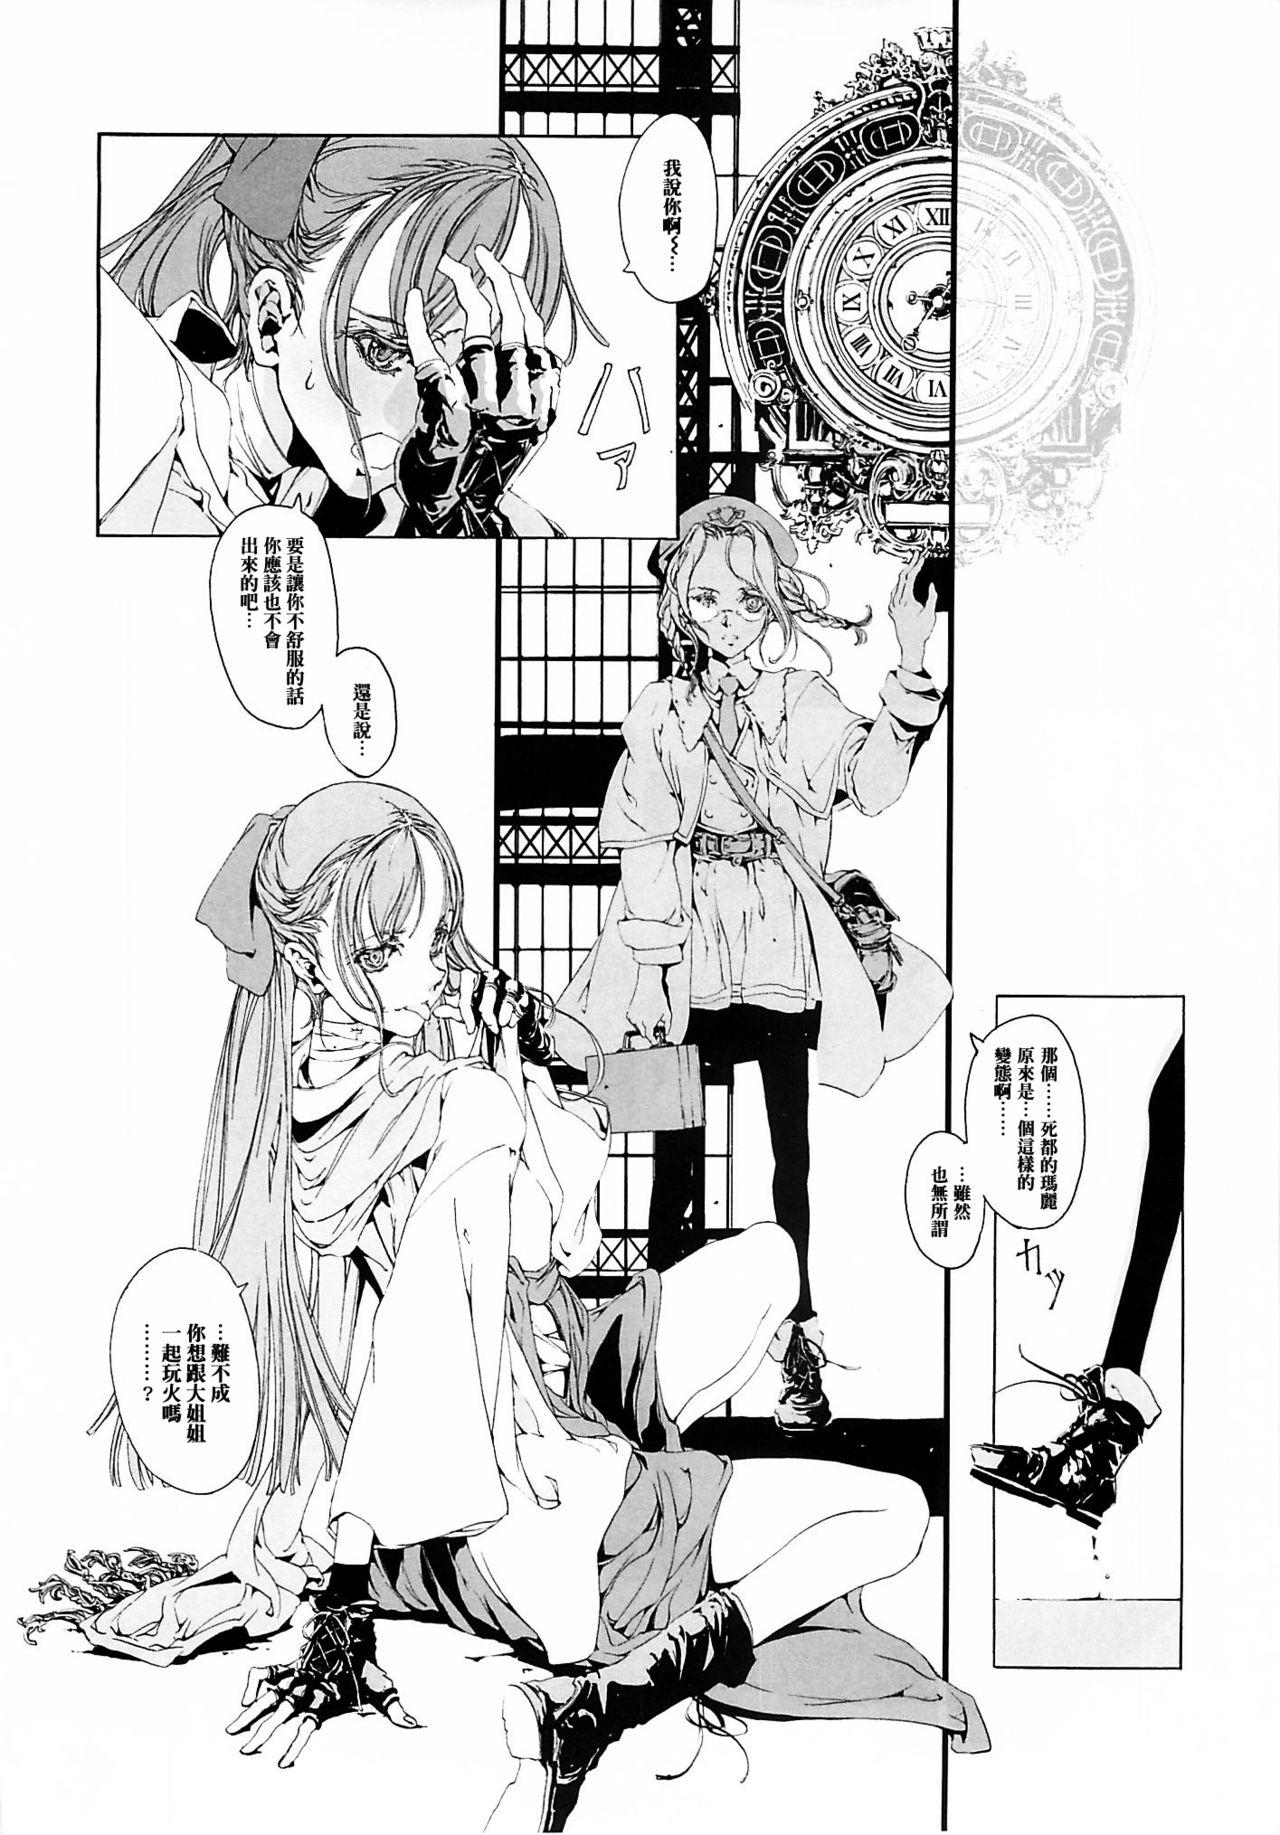 (CR37) [70 Nenshiki Yuukyuu Kikan (Endou Okito)] ORGAN-Tino  01-02[Chinese] [拾荒者汉化组] [Incomplete] 46